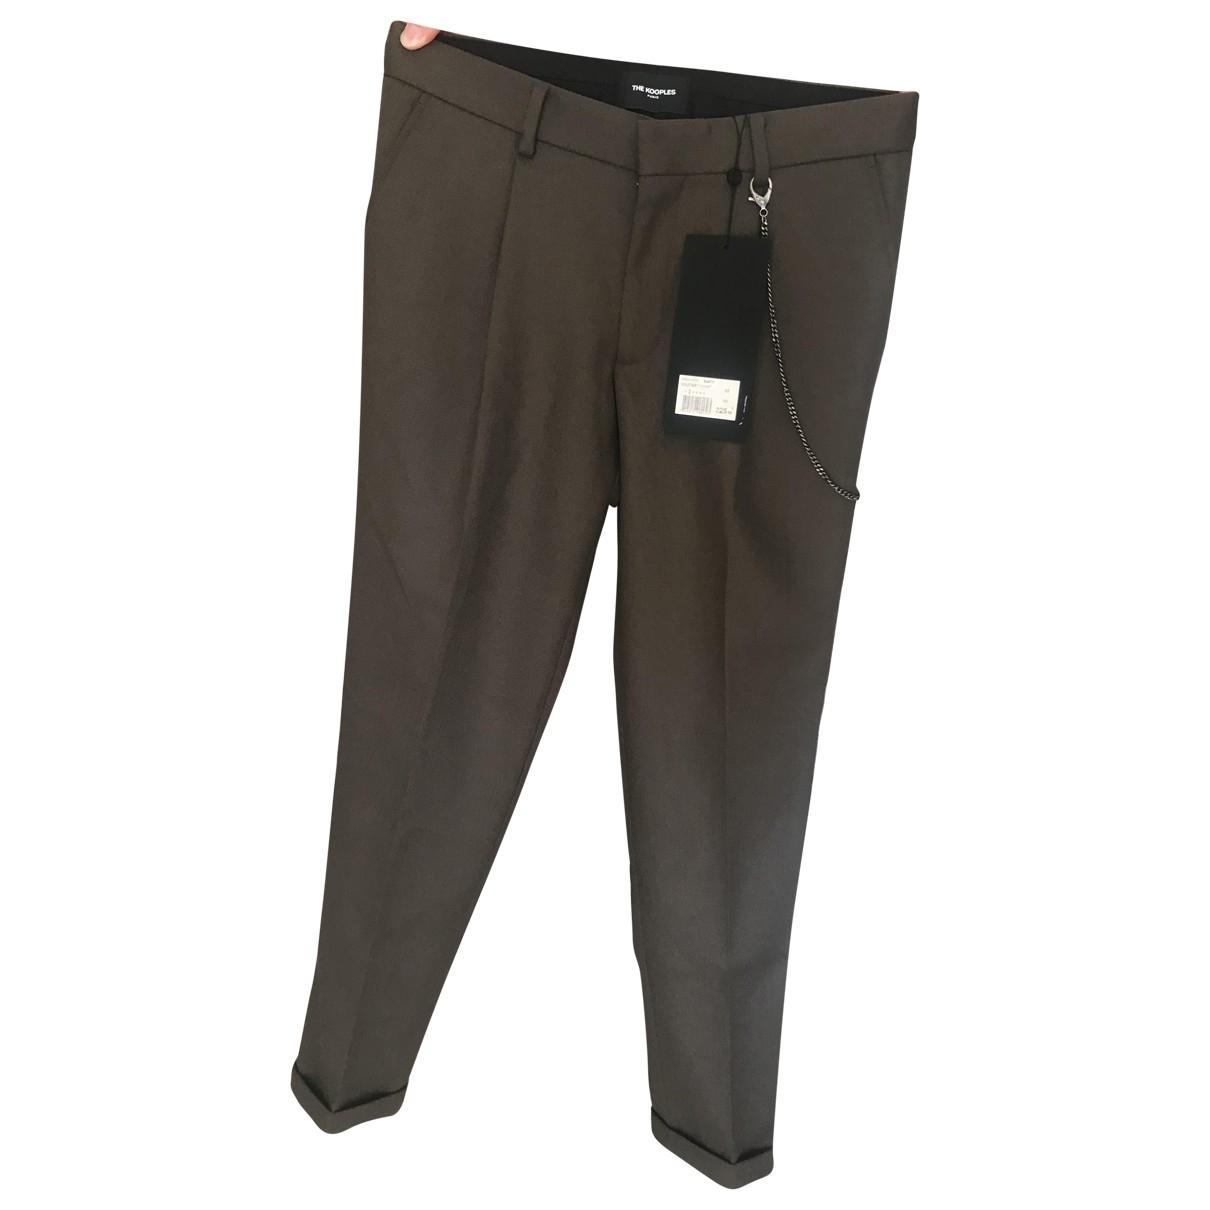 Pantalones Fall Winter 2019 en Algodon Caqui The Kooples